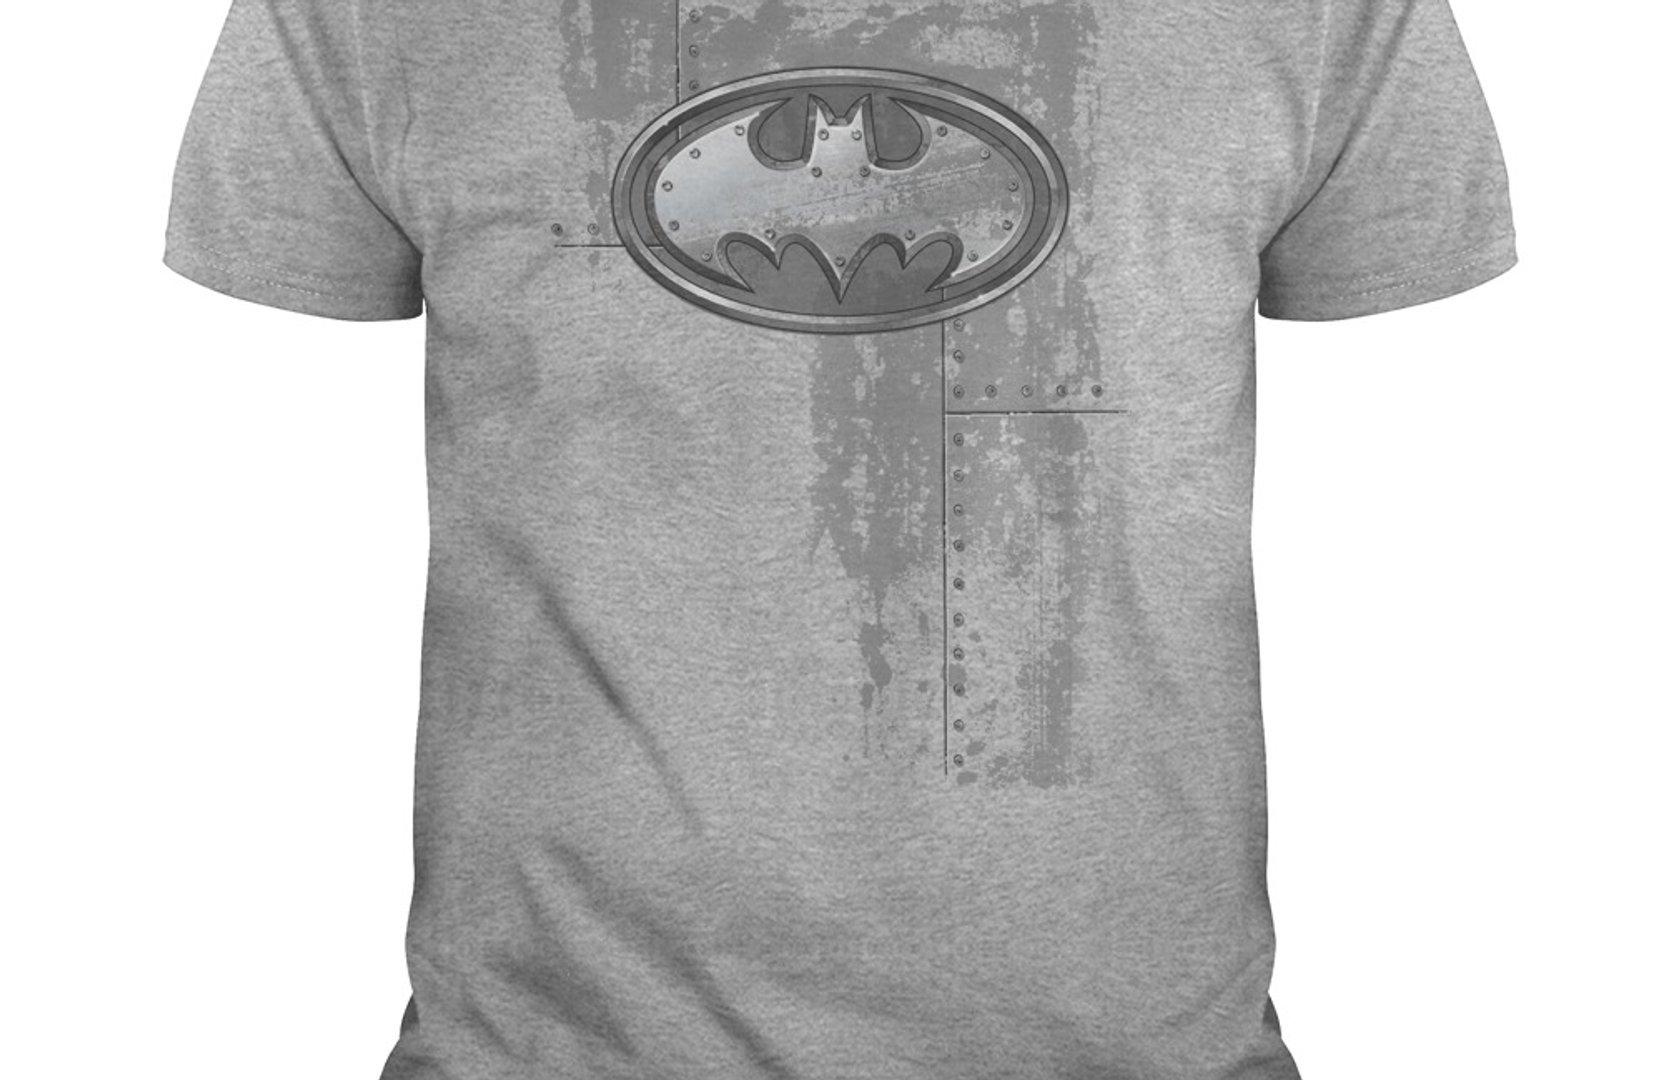 Cool Superhero Tee Shirts - Magazine cover